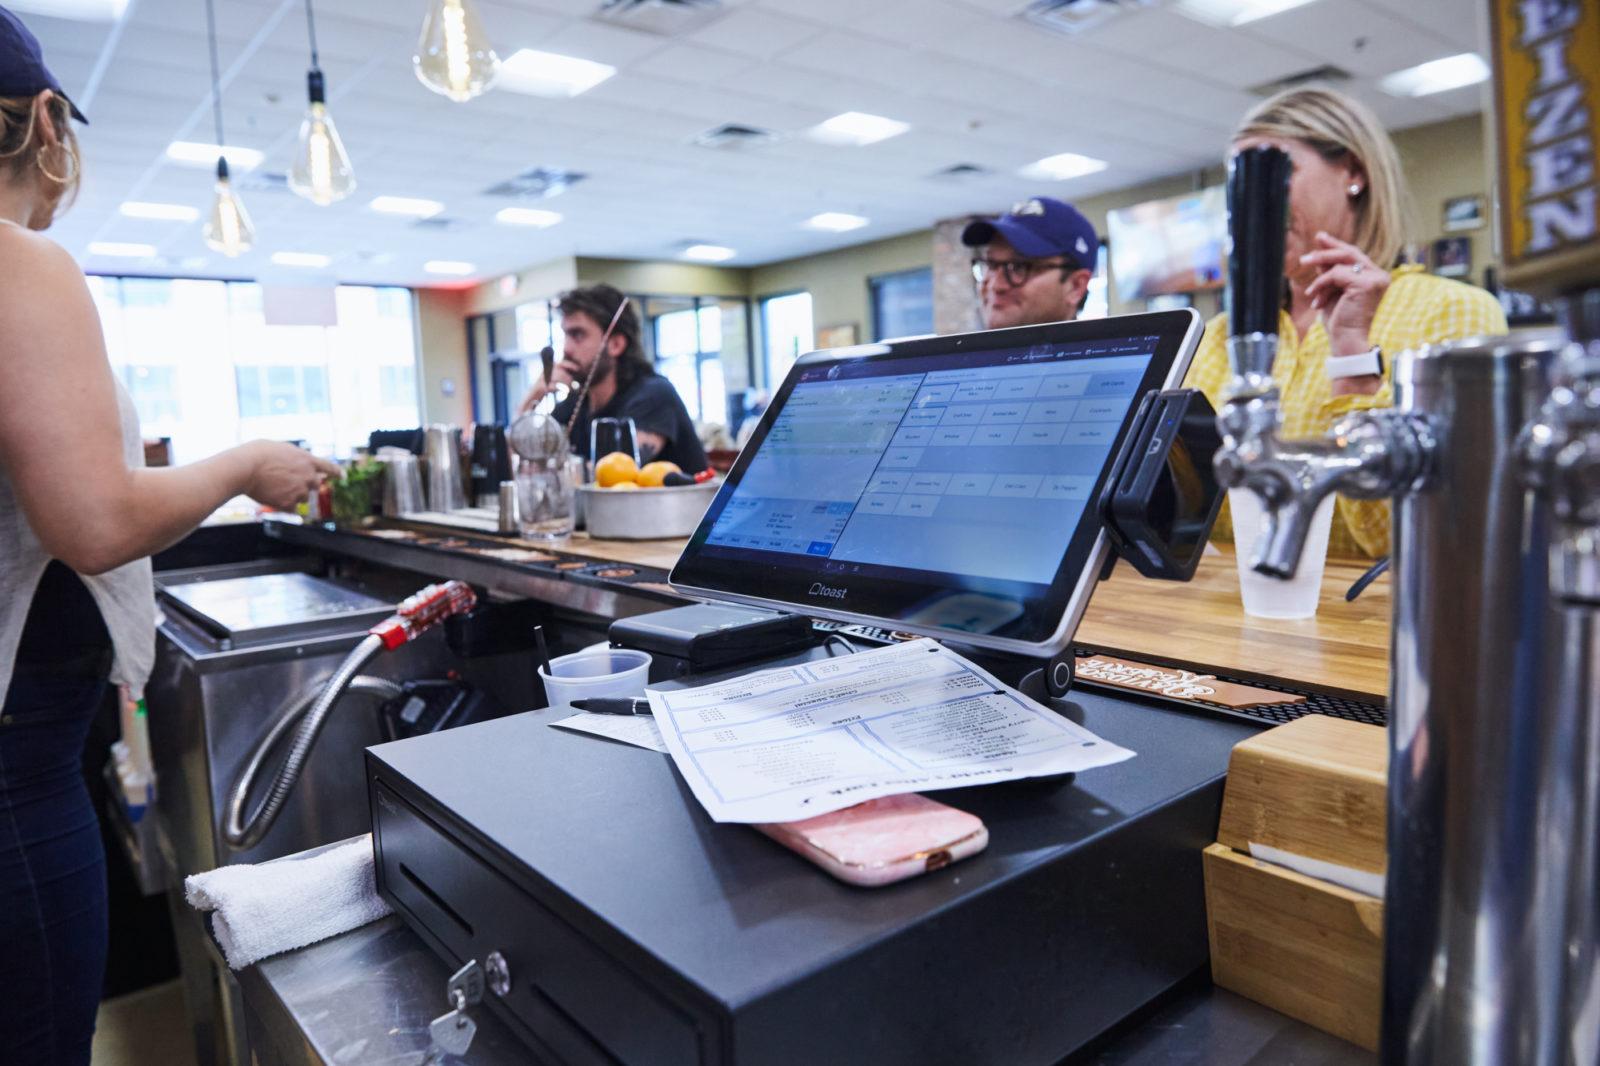 Debit and credit card processors